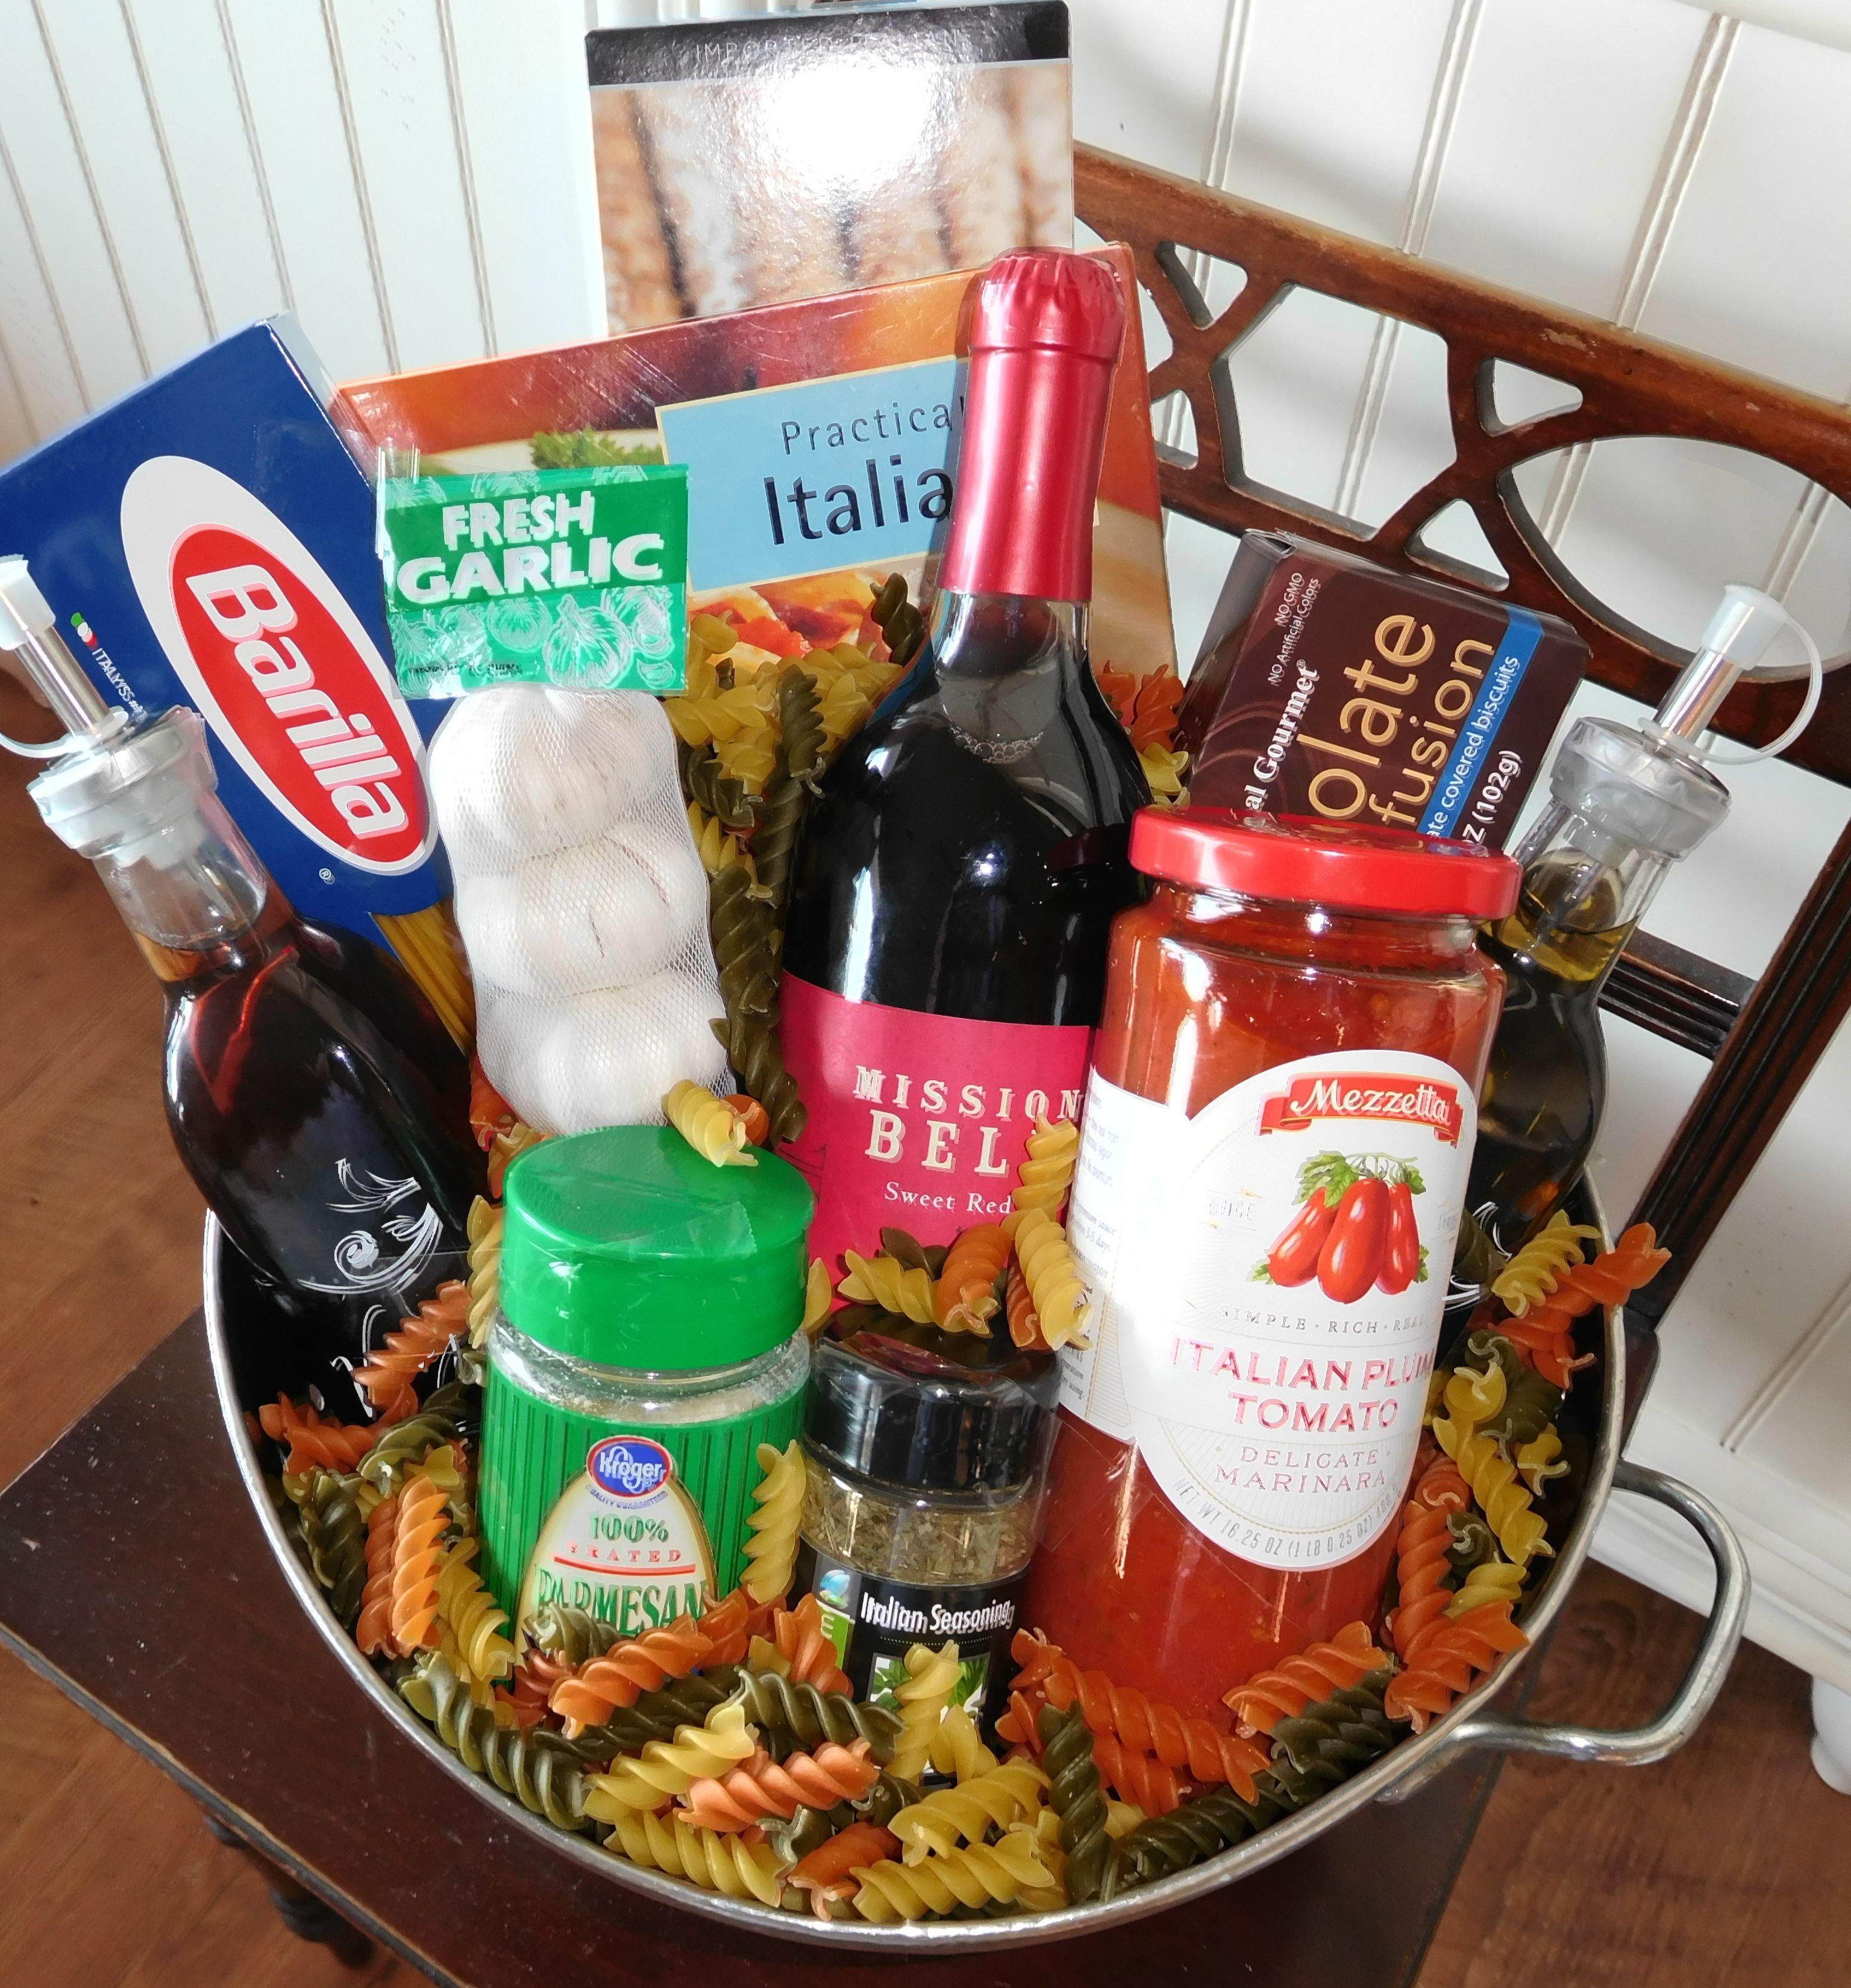 Italian Dinner Basket Pasta Strainer Bread Sticks Italian Cookbook Fresh Garlic Bottle Of Wi Italian Dinner Steak And Lobster Dinner Italian Cook Book